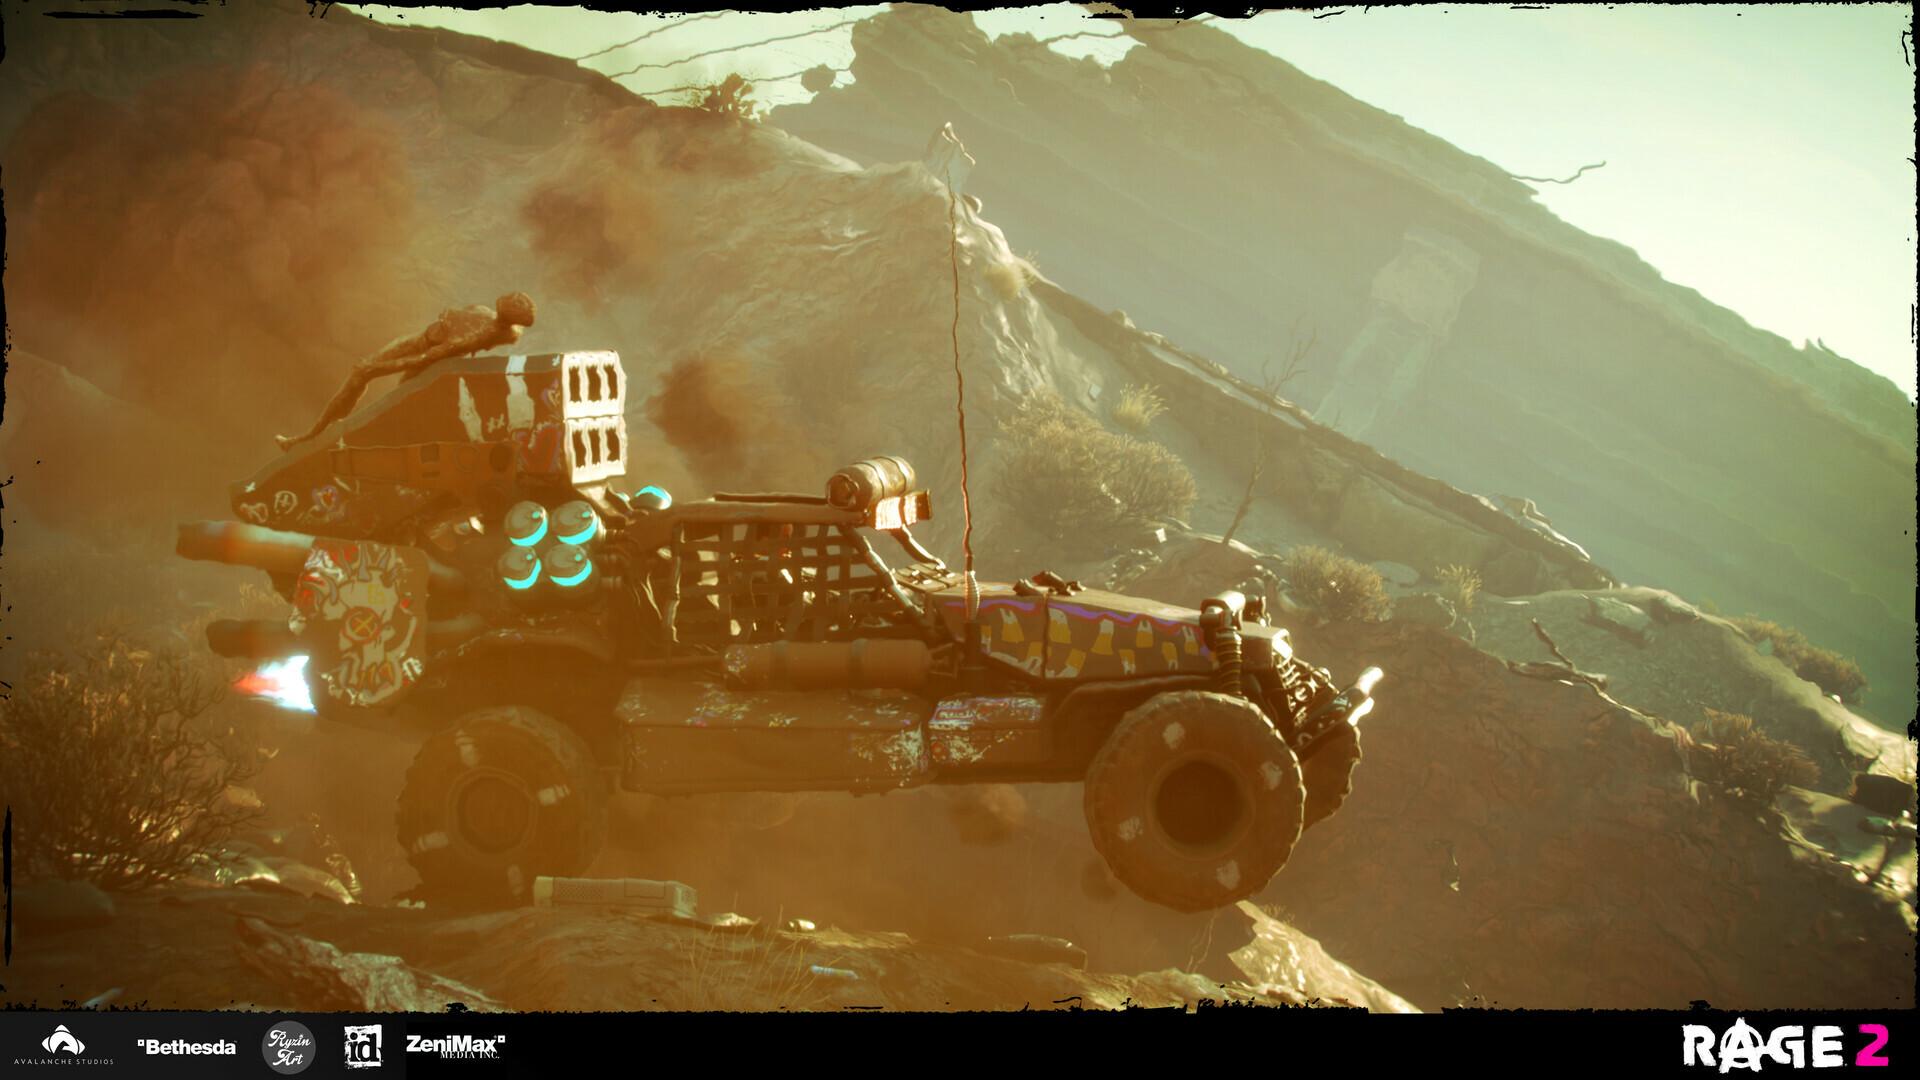 Austin crane ryzin art buggy 03